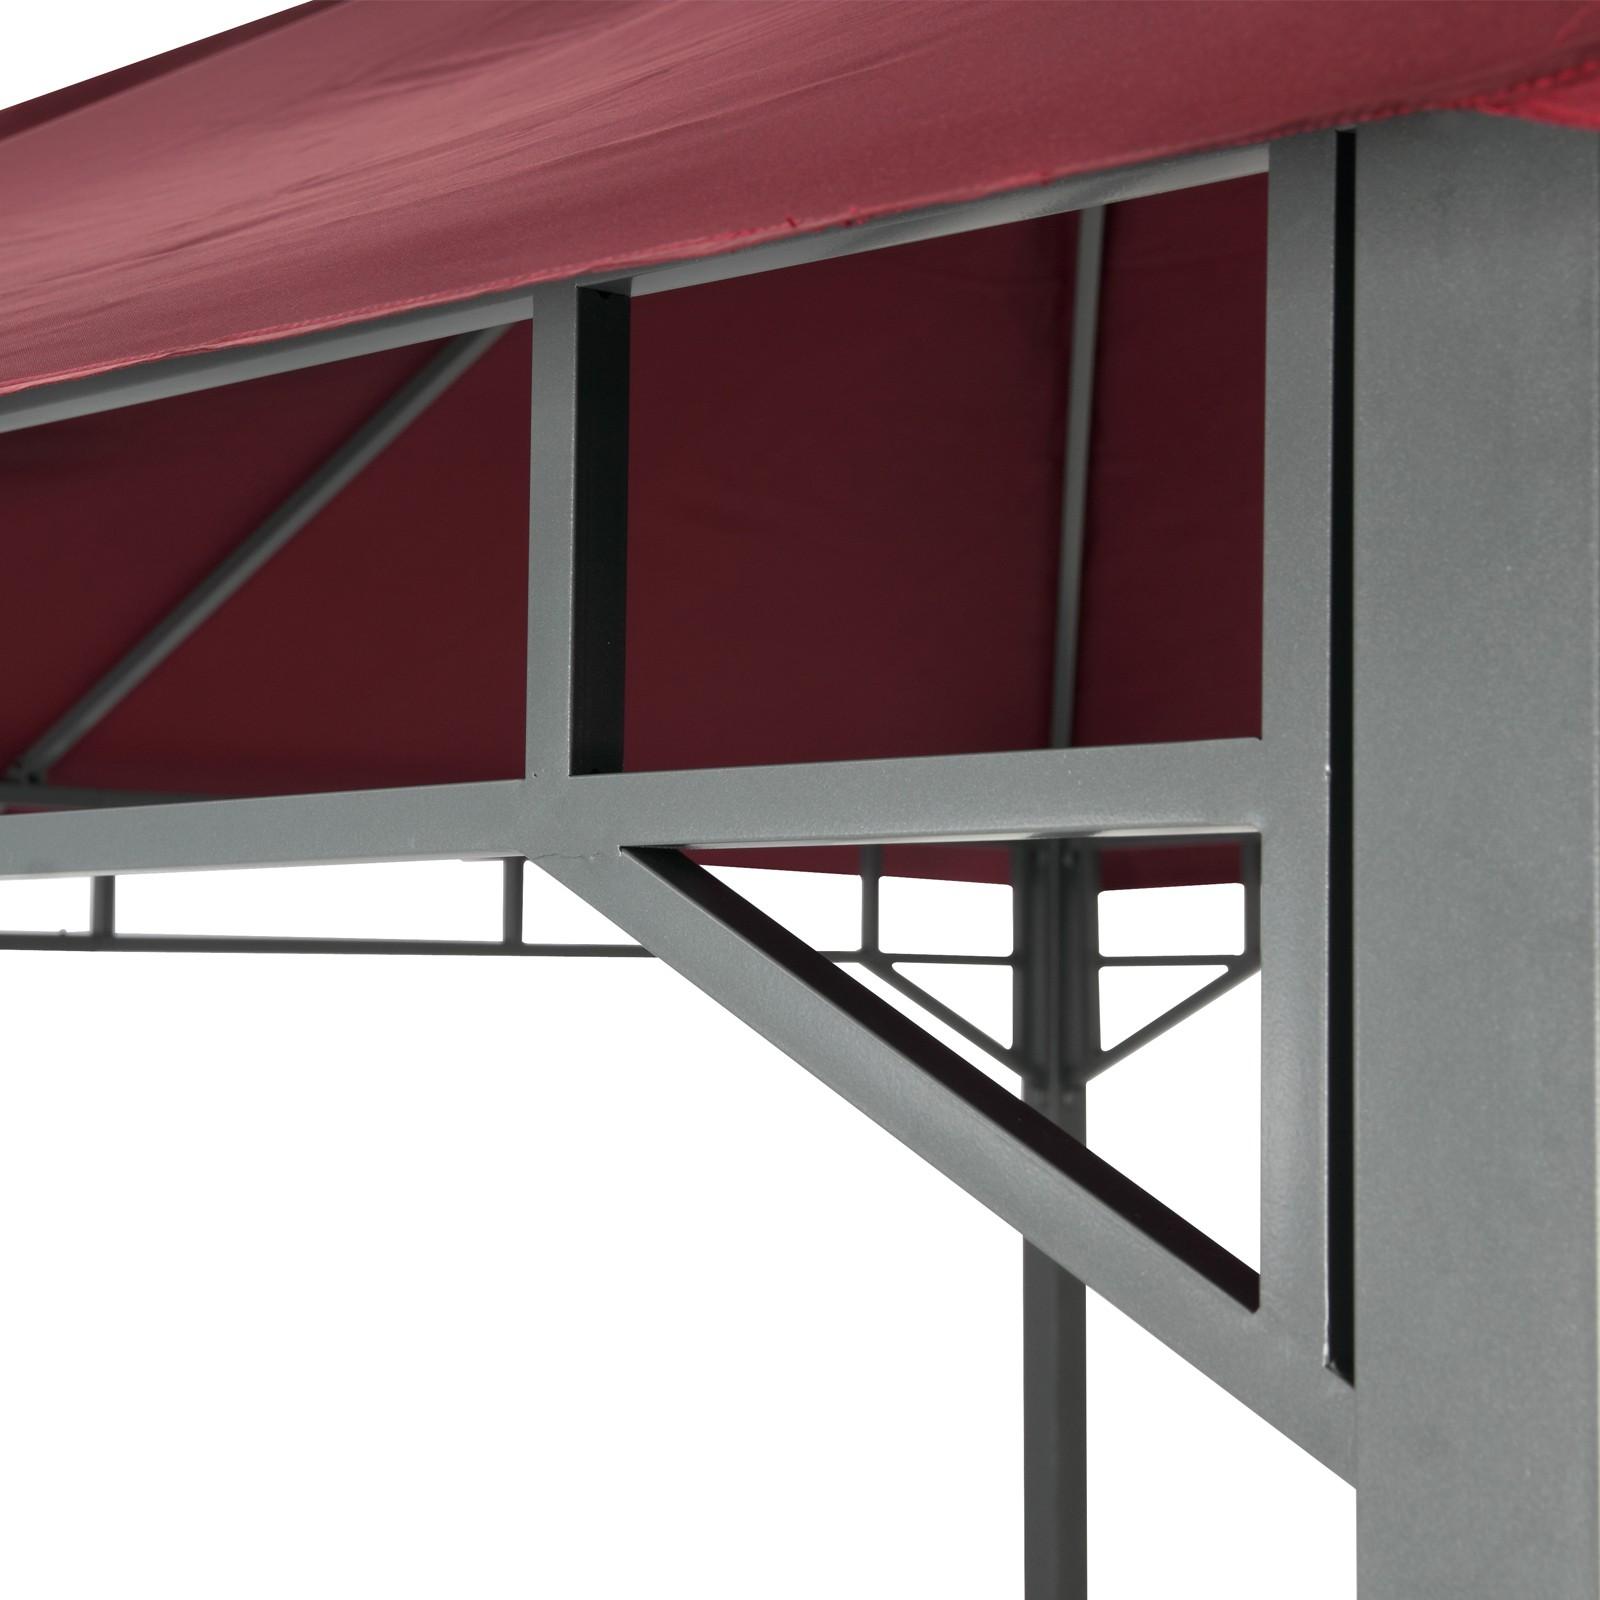 tepro gartenpavillon pavillon 3x3 stahlgestell garten partyzelt lehua burgund ebay. Black Bedroom Furniture Sets. Home Design Ideas